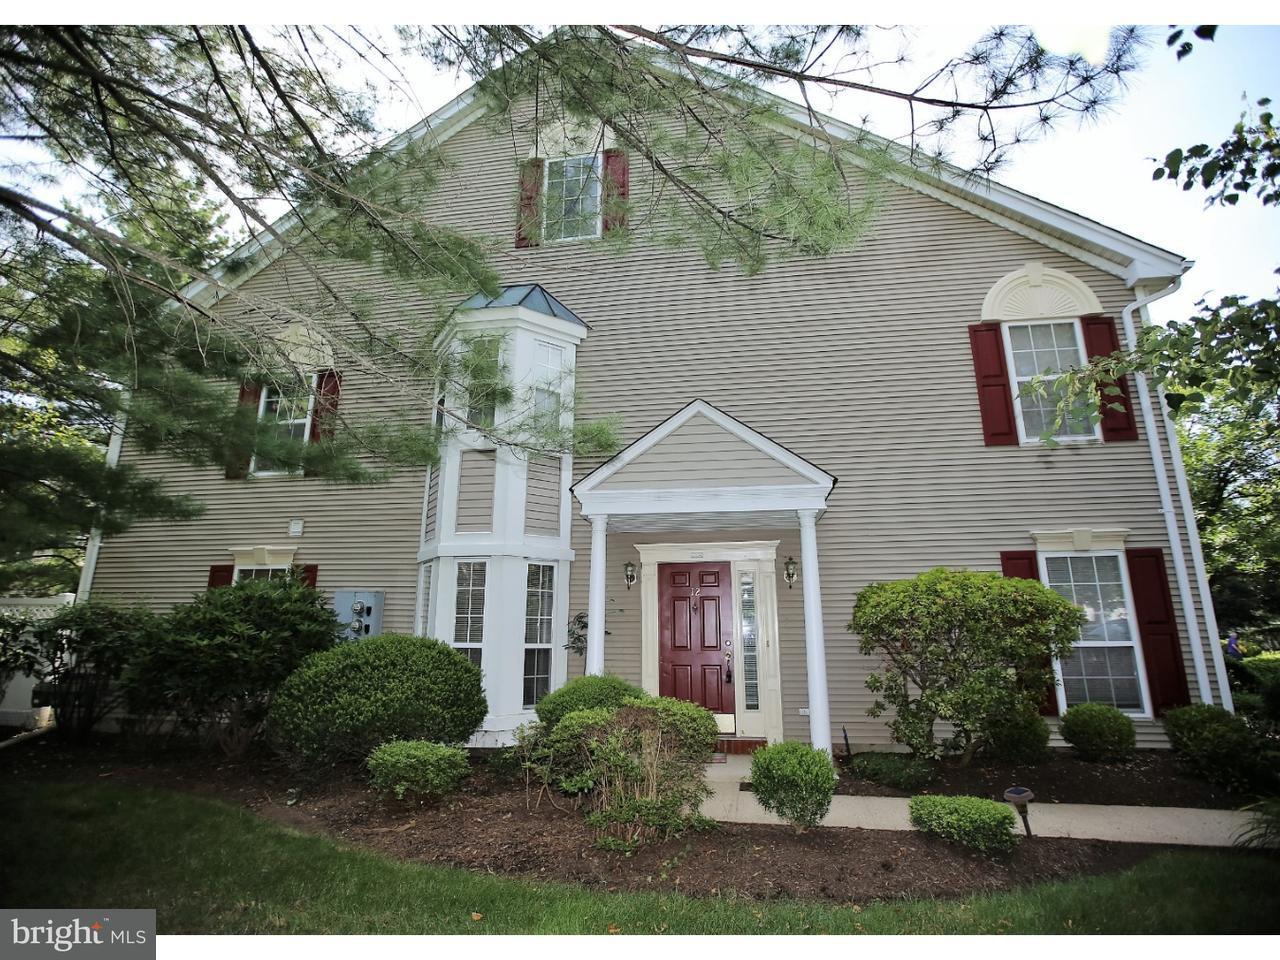 Casa unifamiliar adosada (Townhouse) por un Alquiler en 12 LEE Court Plainsboro, Nueva Jersey 08536 Estados UnidosEn/Alrededor: Plainsboro Township